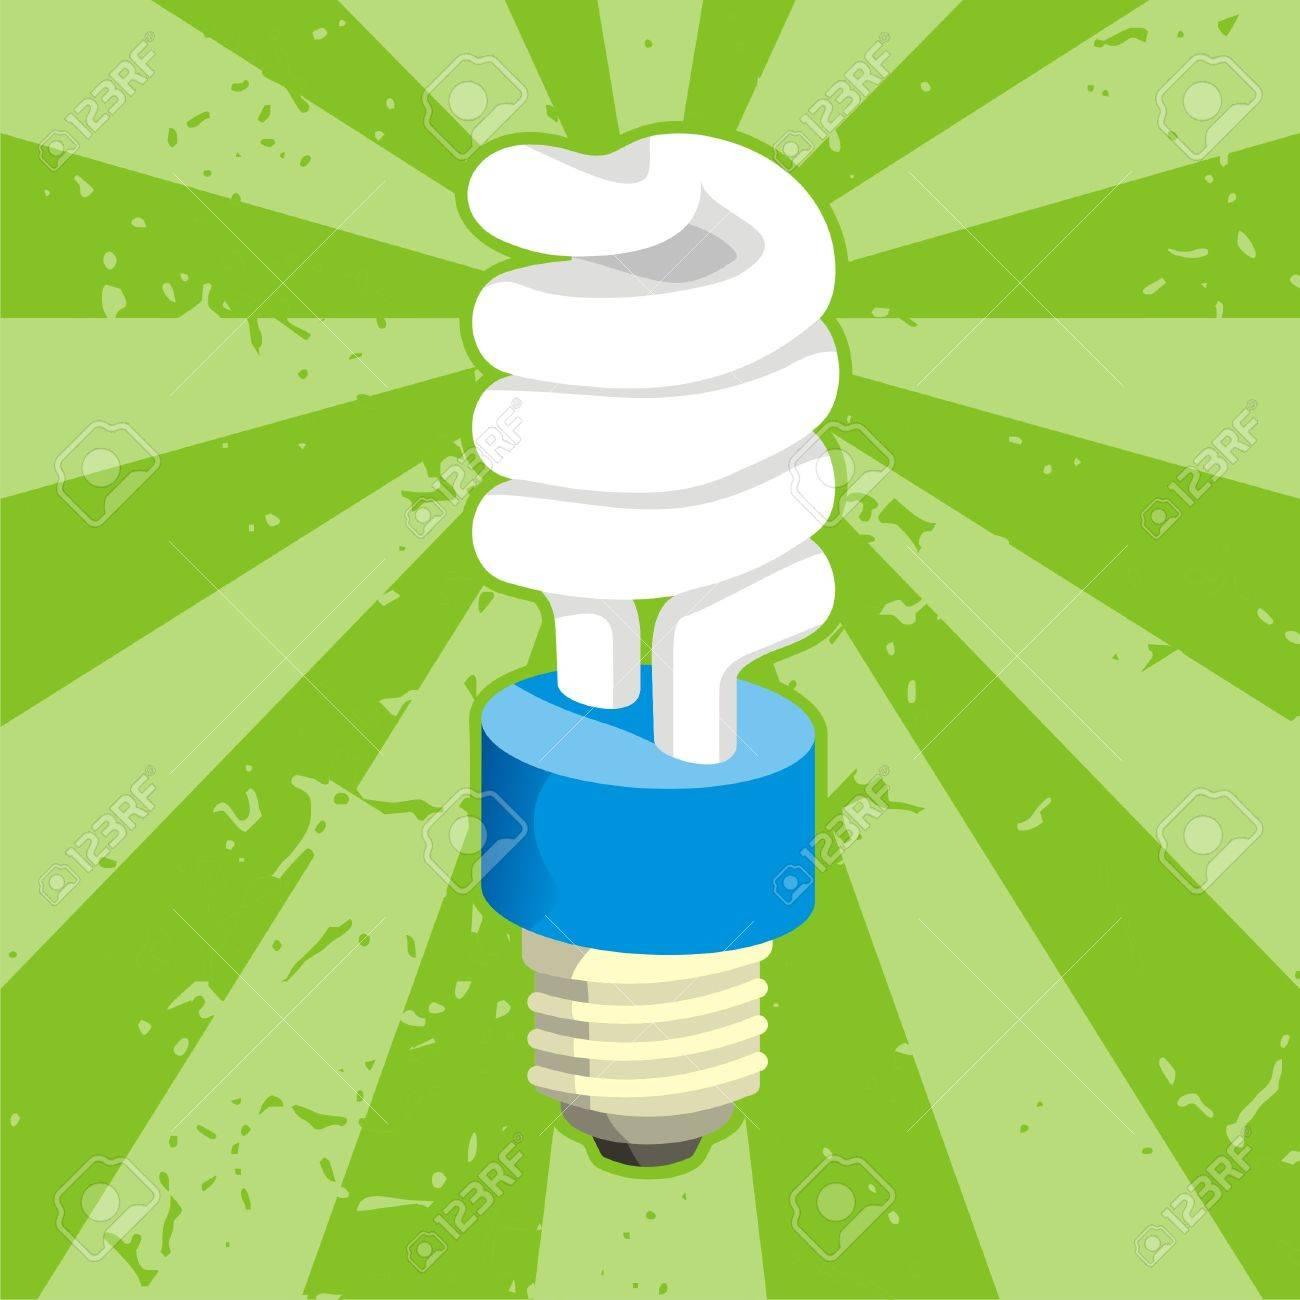 Spiral compact fluorescent light bulb on grunge background - 3654297